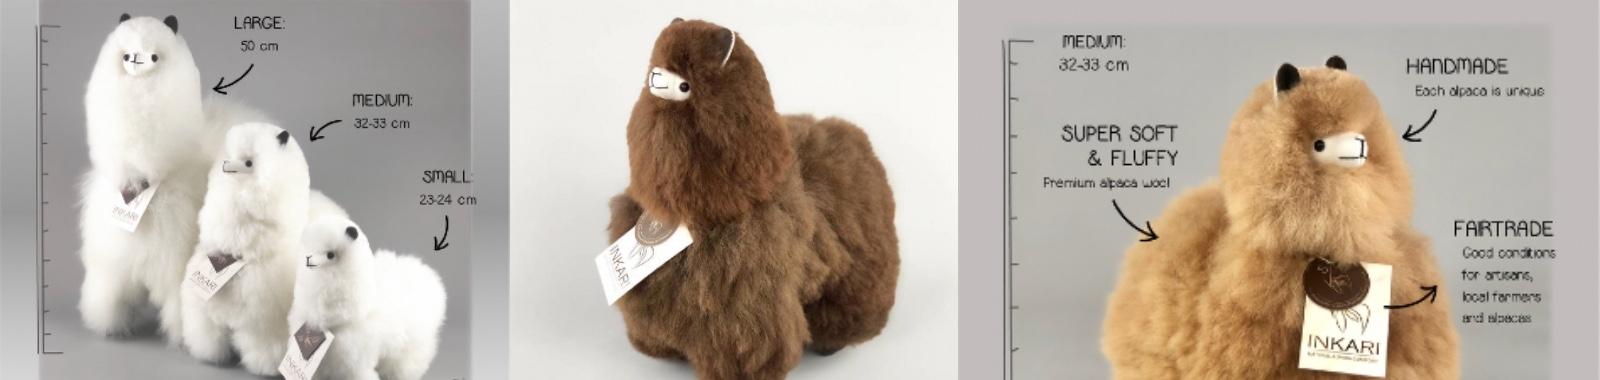 Zachte alpaca knuffel